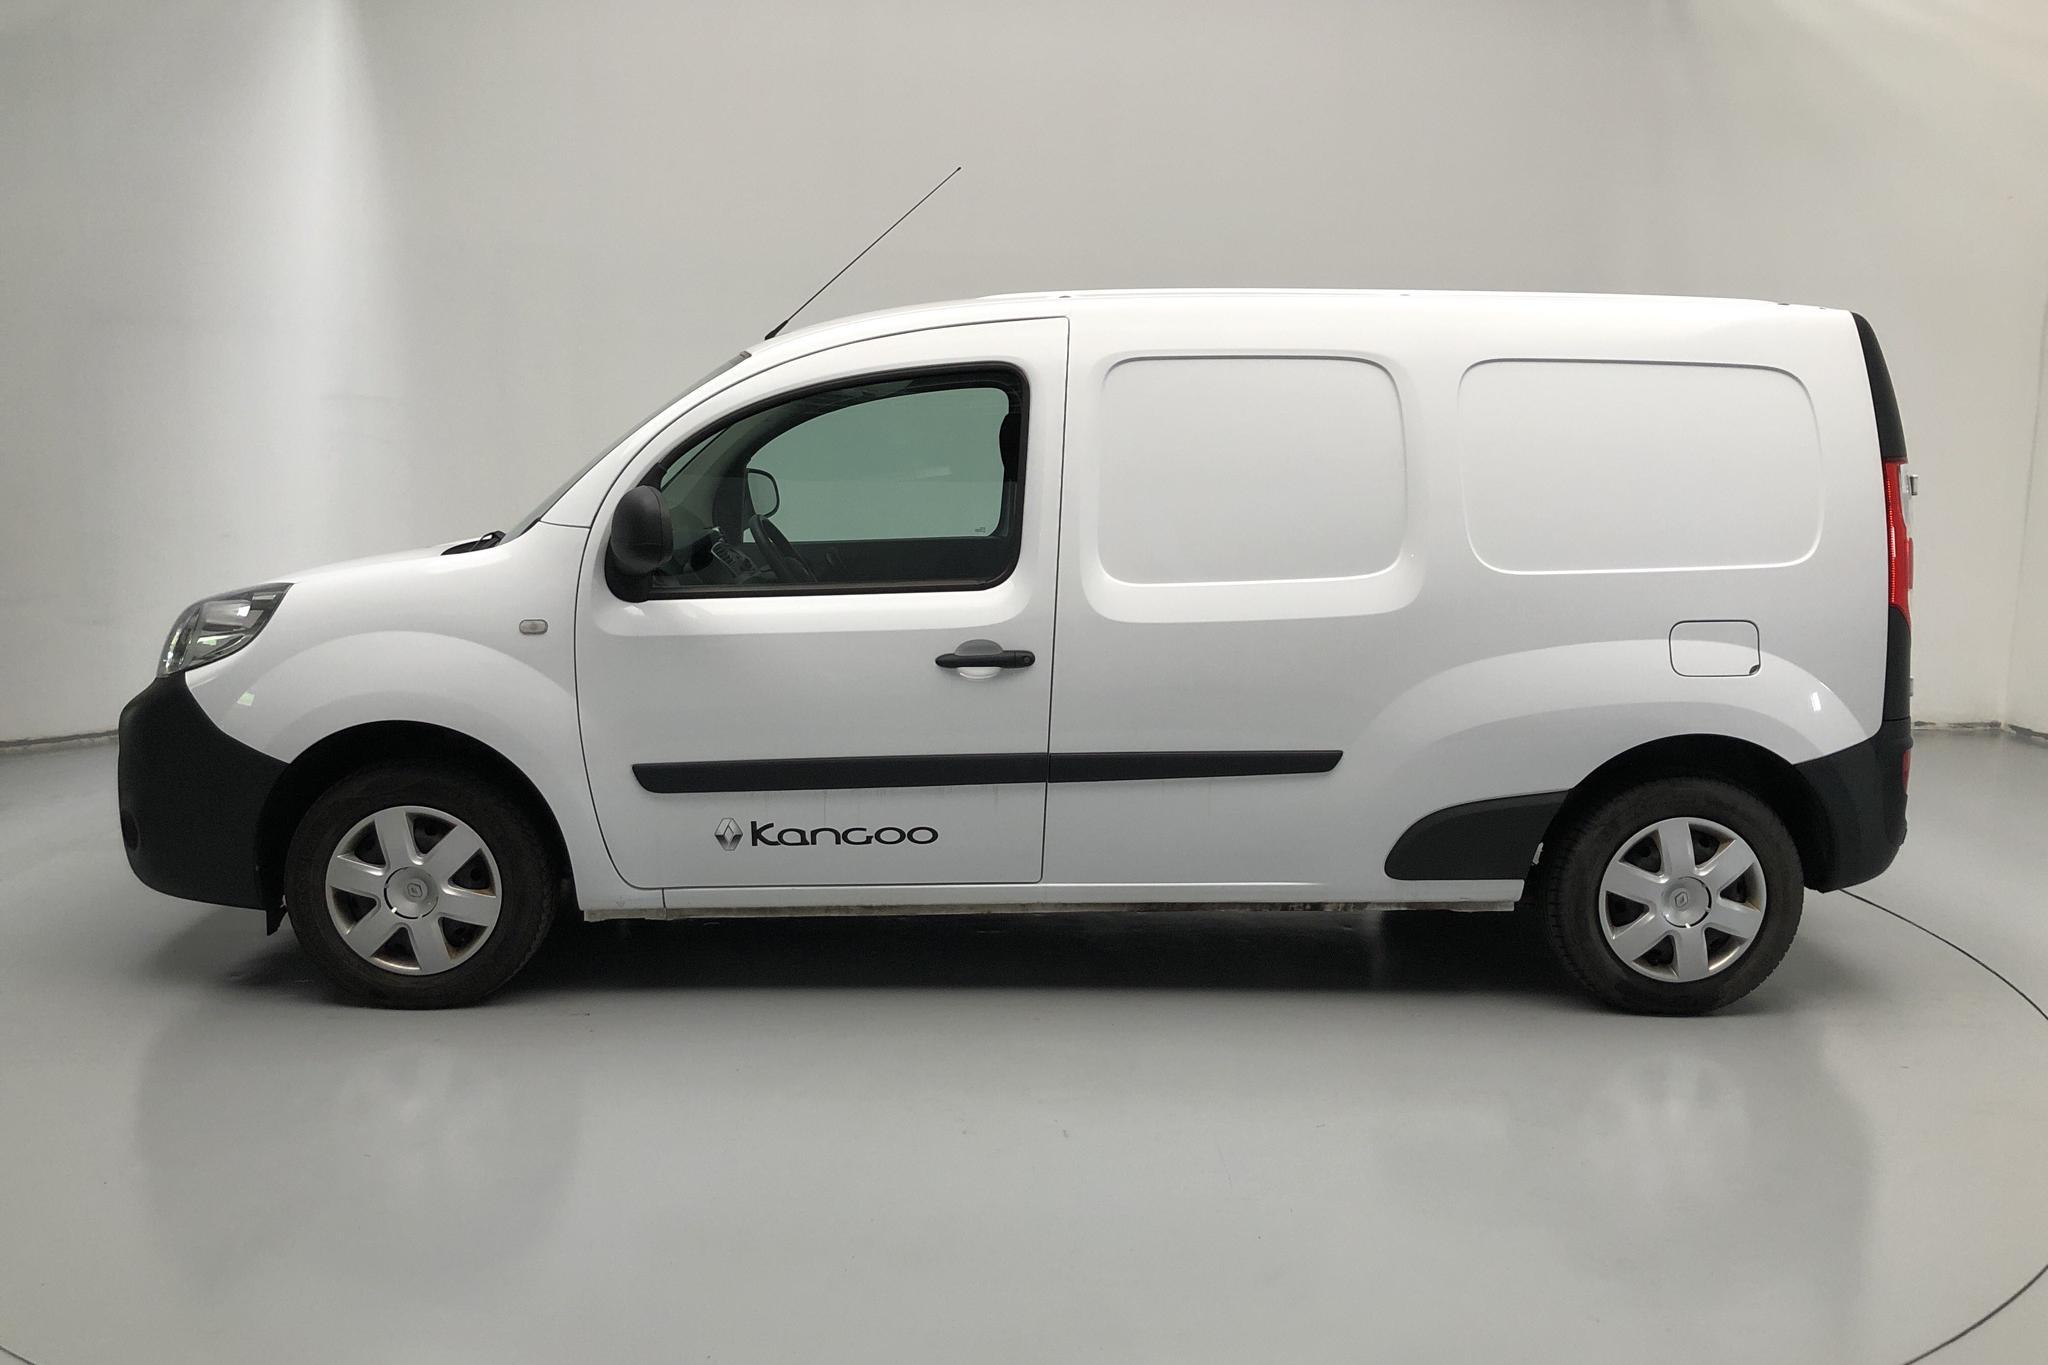 Renault Kangoo 1.5 dCi Maxi skåp (90hk) - 3 125 mil - Manuell - vit - 2016